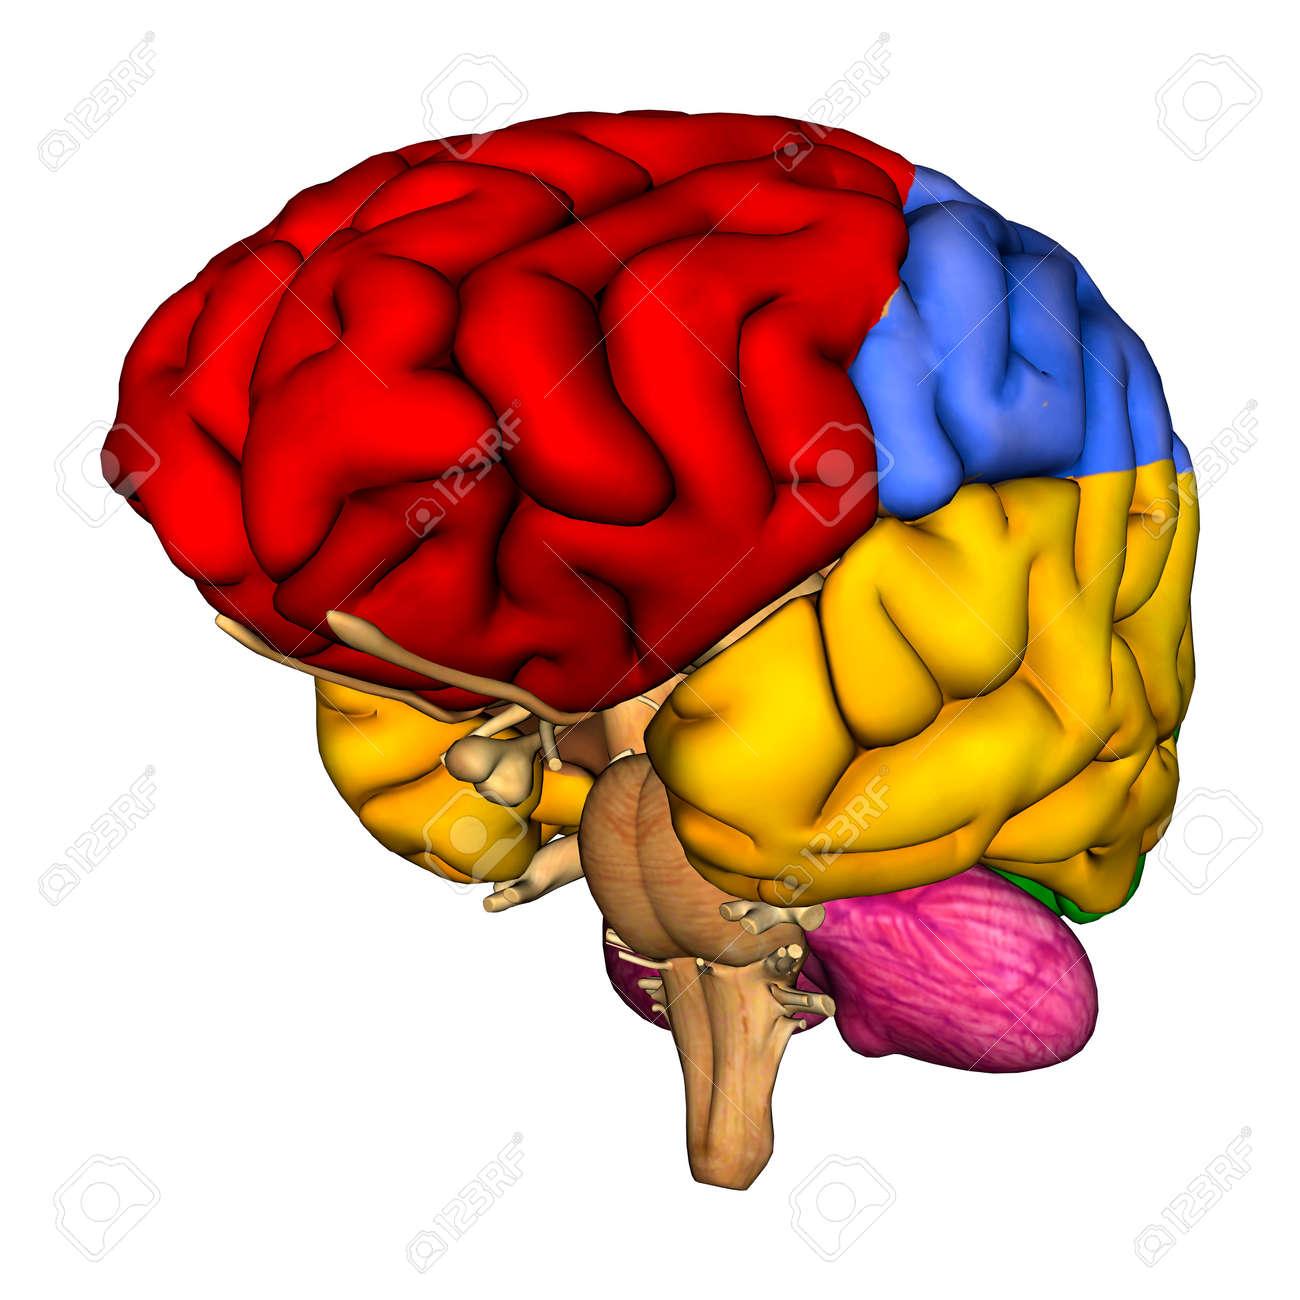 3d digital render of a human brain diagram isolated on white stock3d digital render of a human brain diagram isolated on white stock photo 24924769